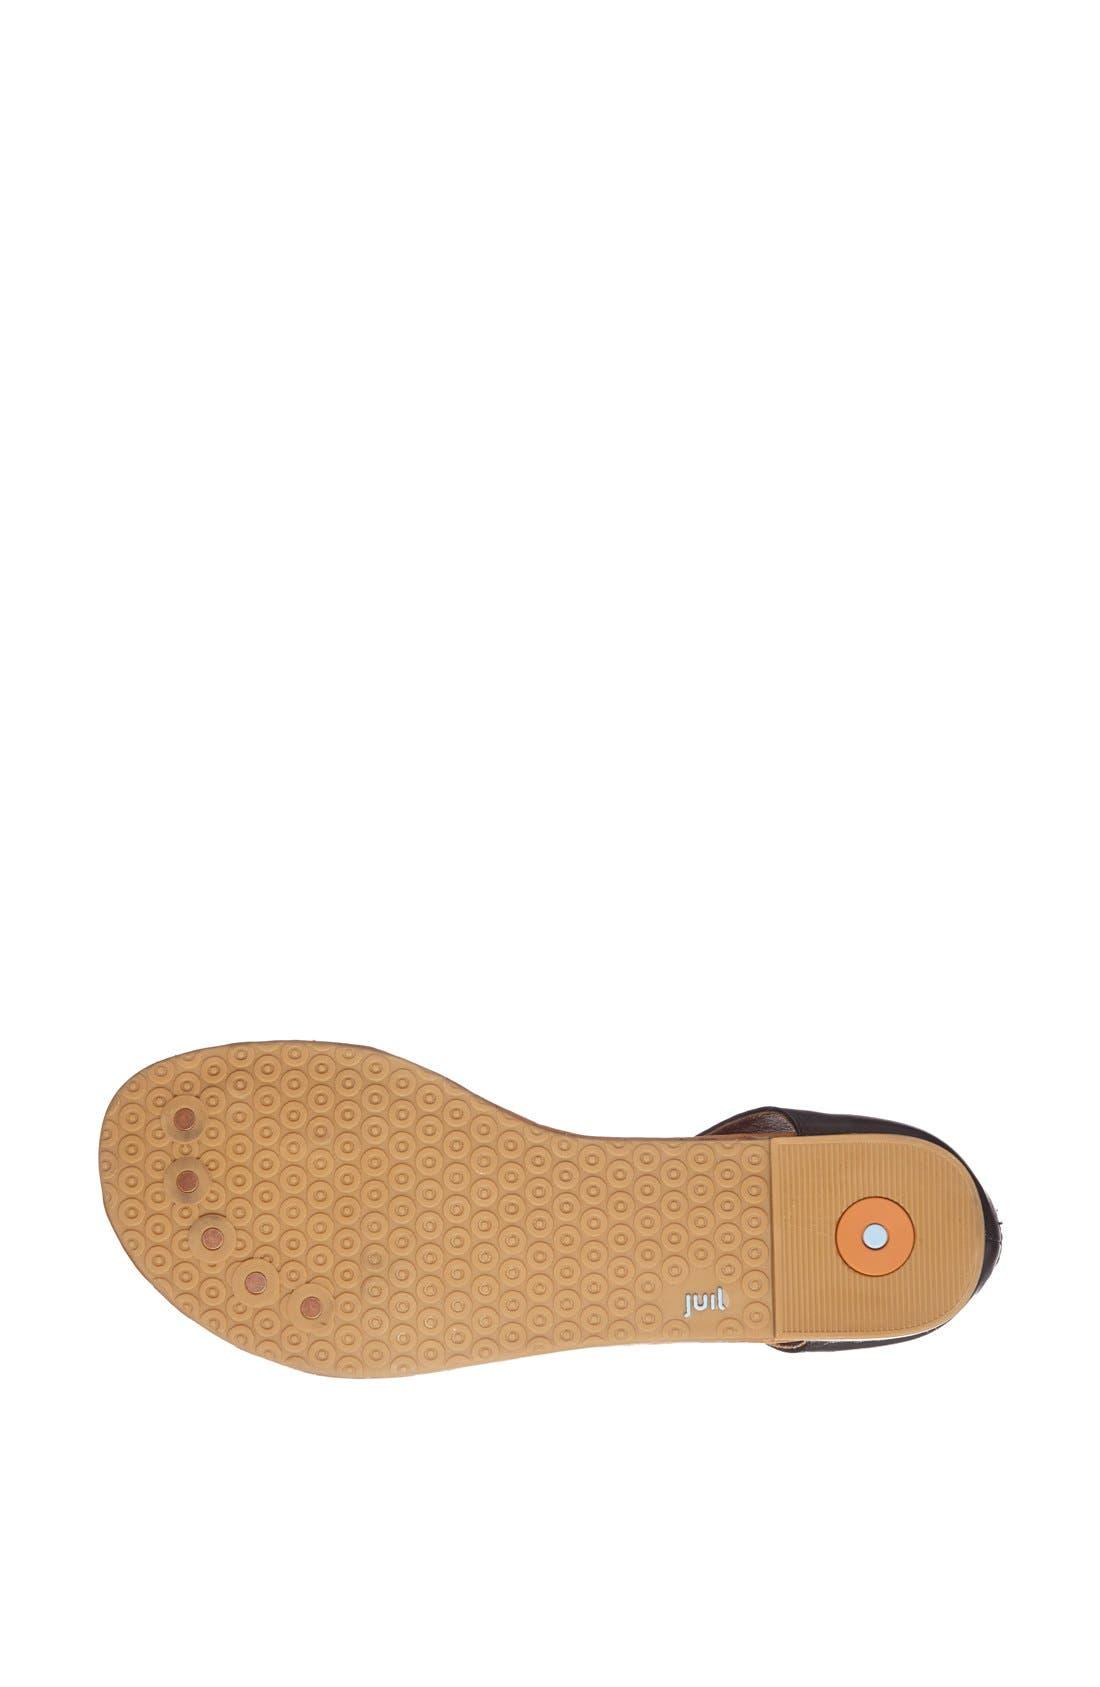 'Luna' Metallic Leather Thong Sandal,                             Alternate thumbnail 3, color,                             010